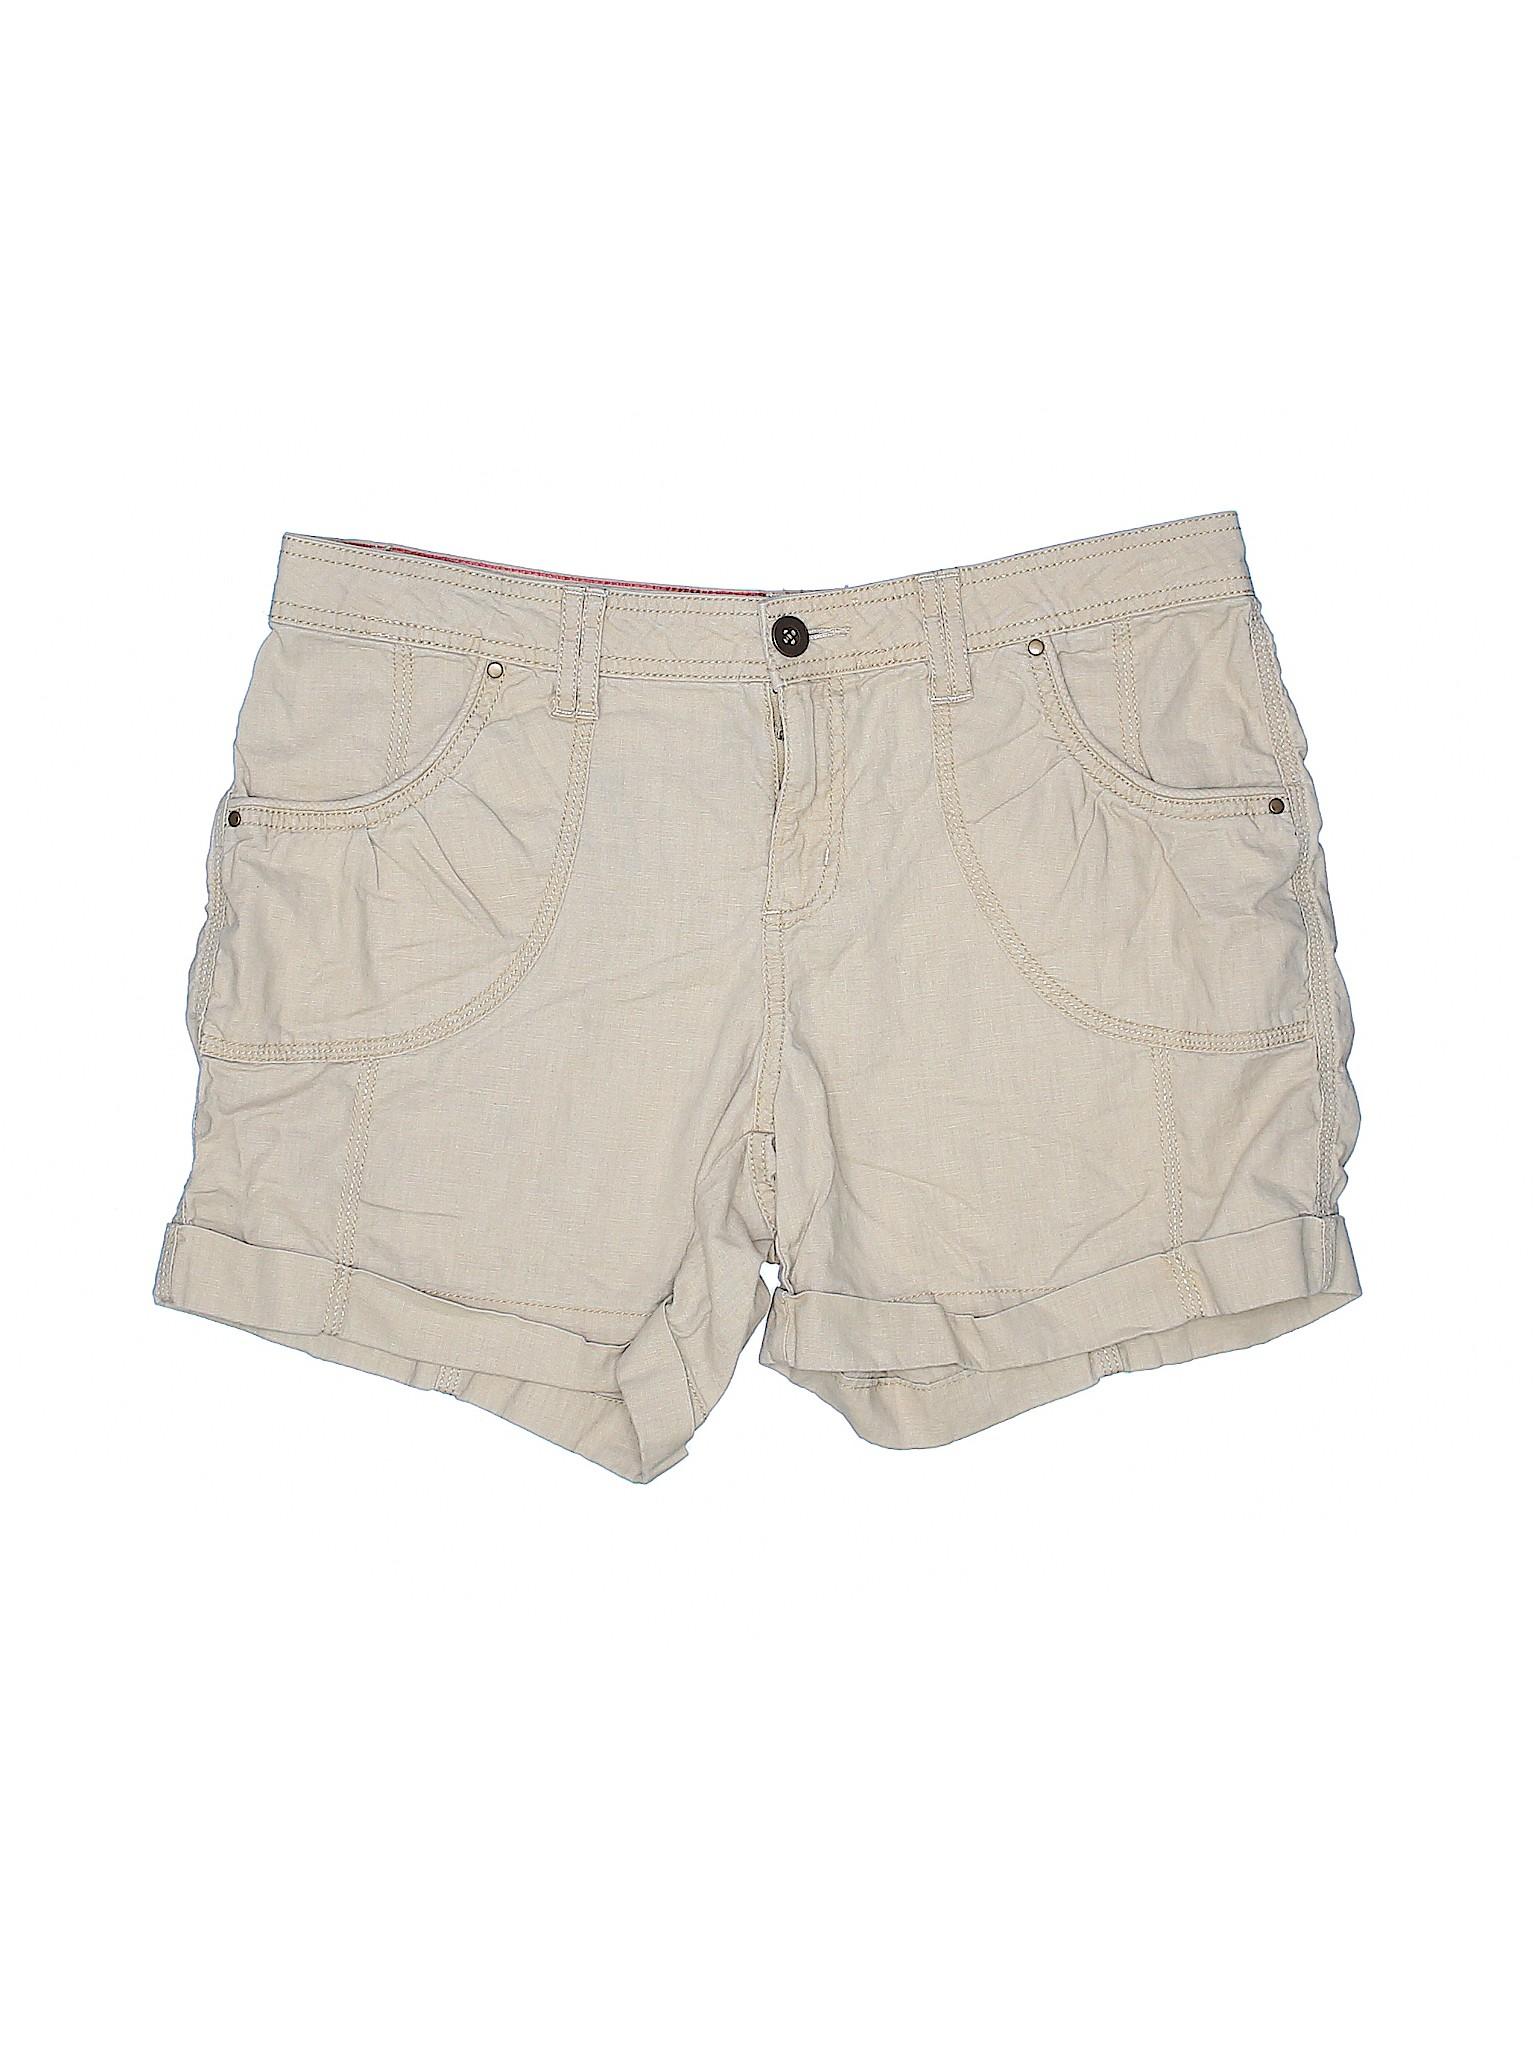 Boutique Apt Shorts Shorts 9 9 Apt Shorts 9 Apt Boutique Boutique Apt Boutique Boutique 9 Shorts ECwS4Oxq